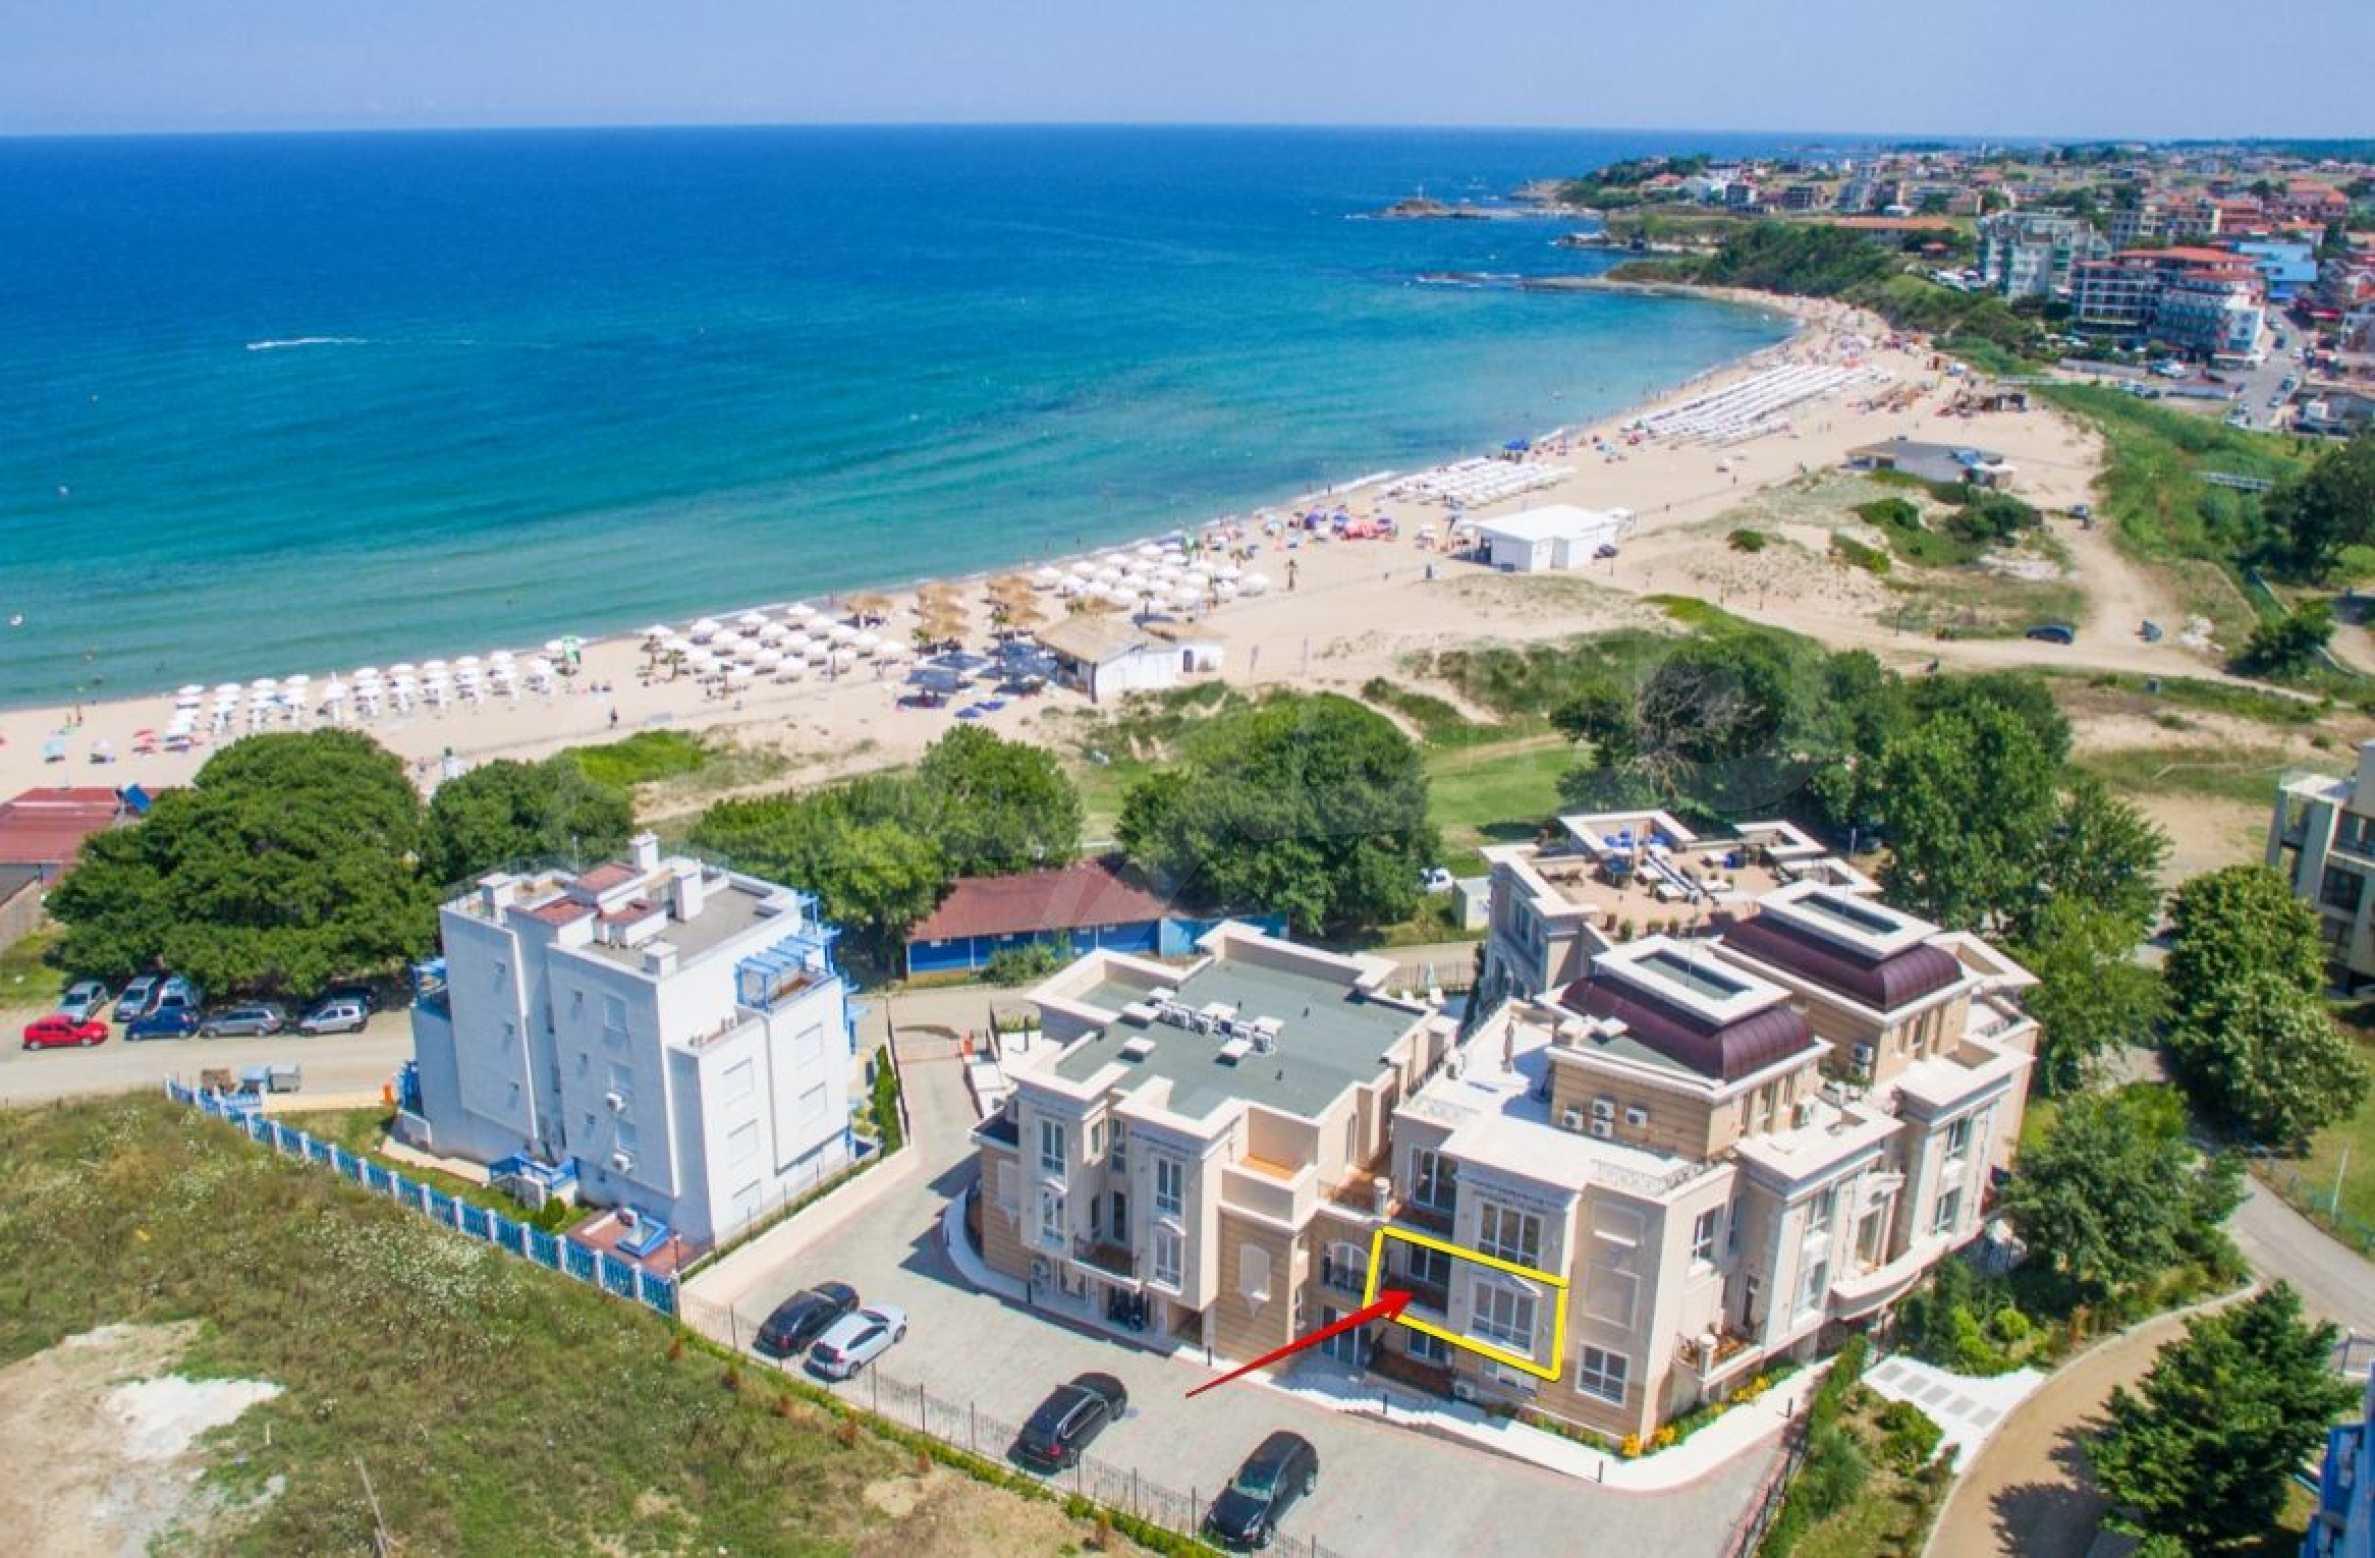 Първокласен двустаен апартамент в Belle Époque Beach Residence (ап. №A 206) 20